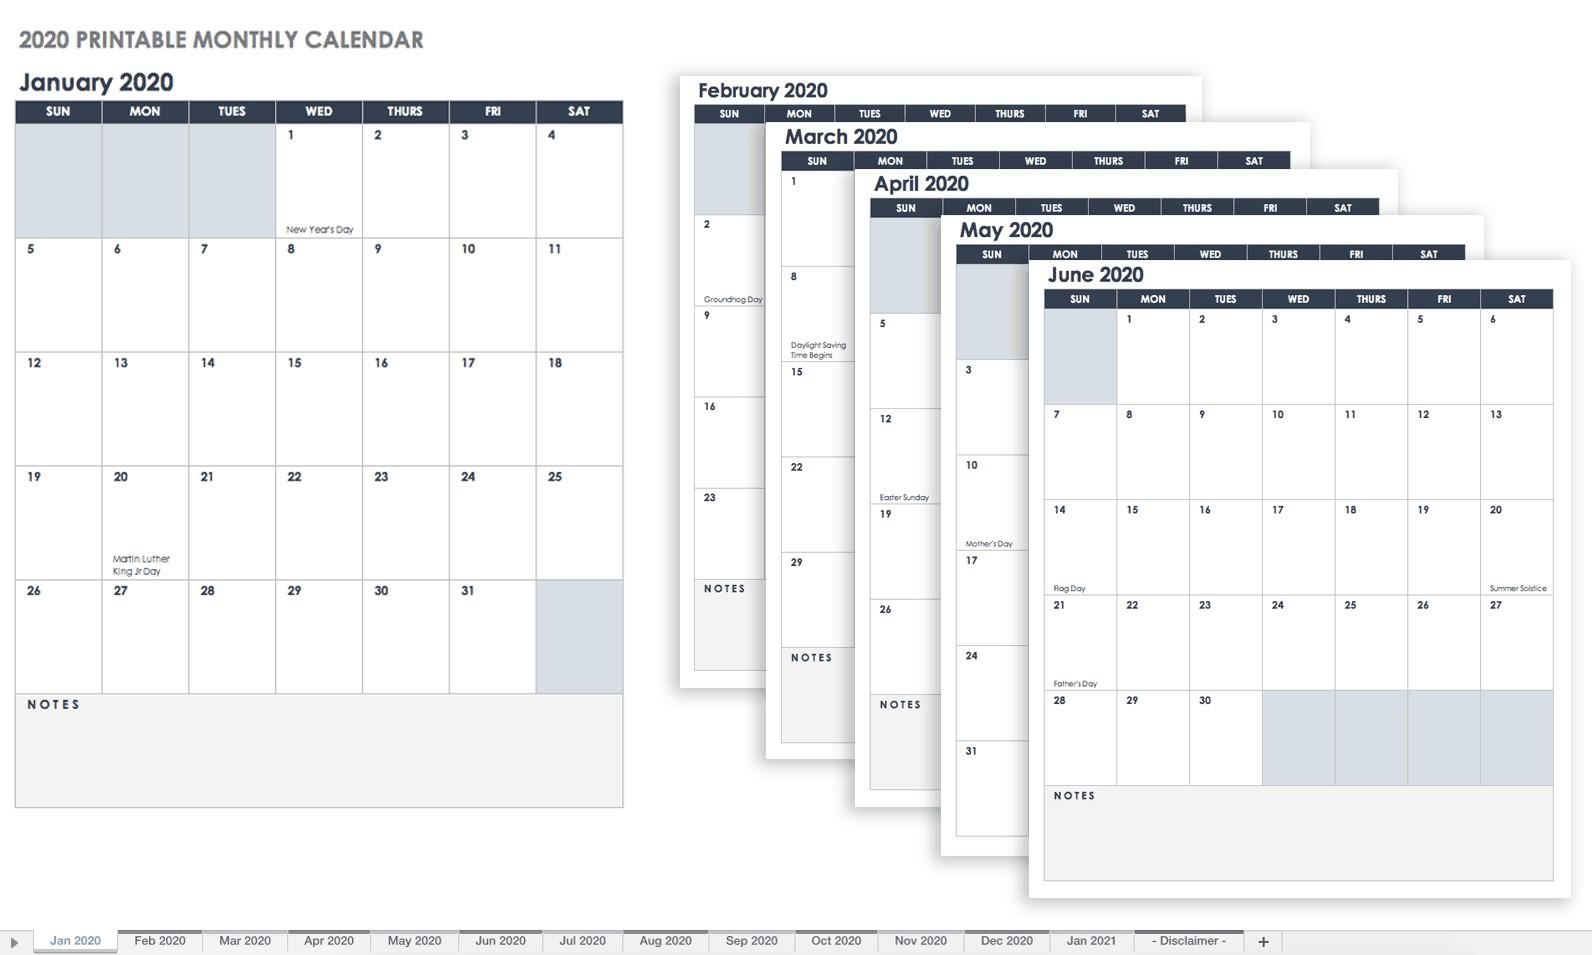 Monthly Calendar 2020 Printable Free Excel Calendar Templates